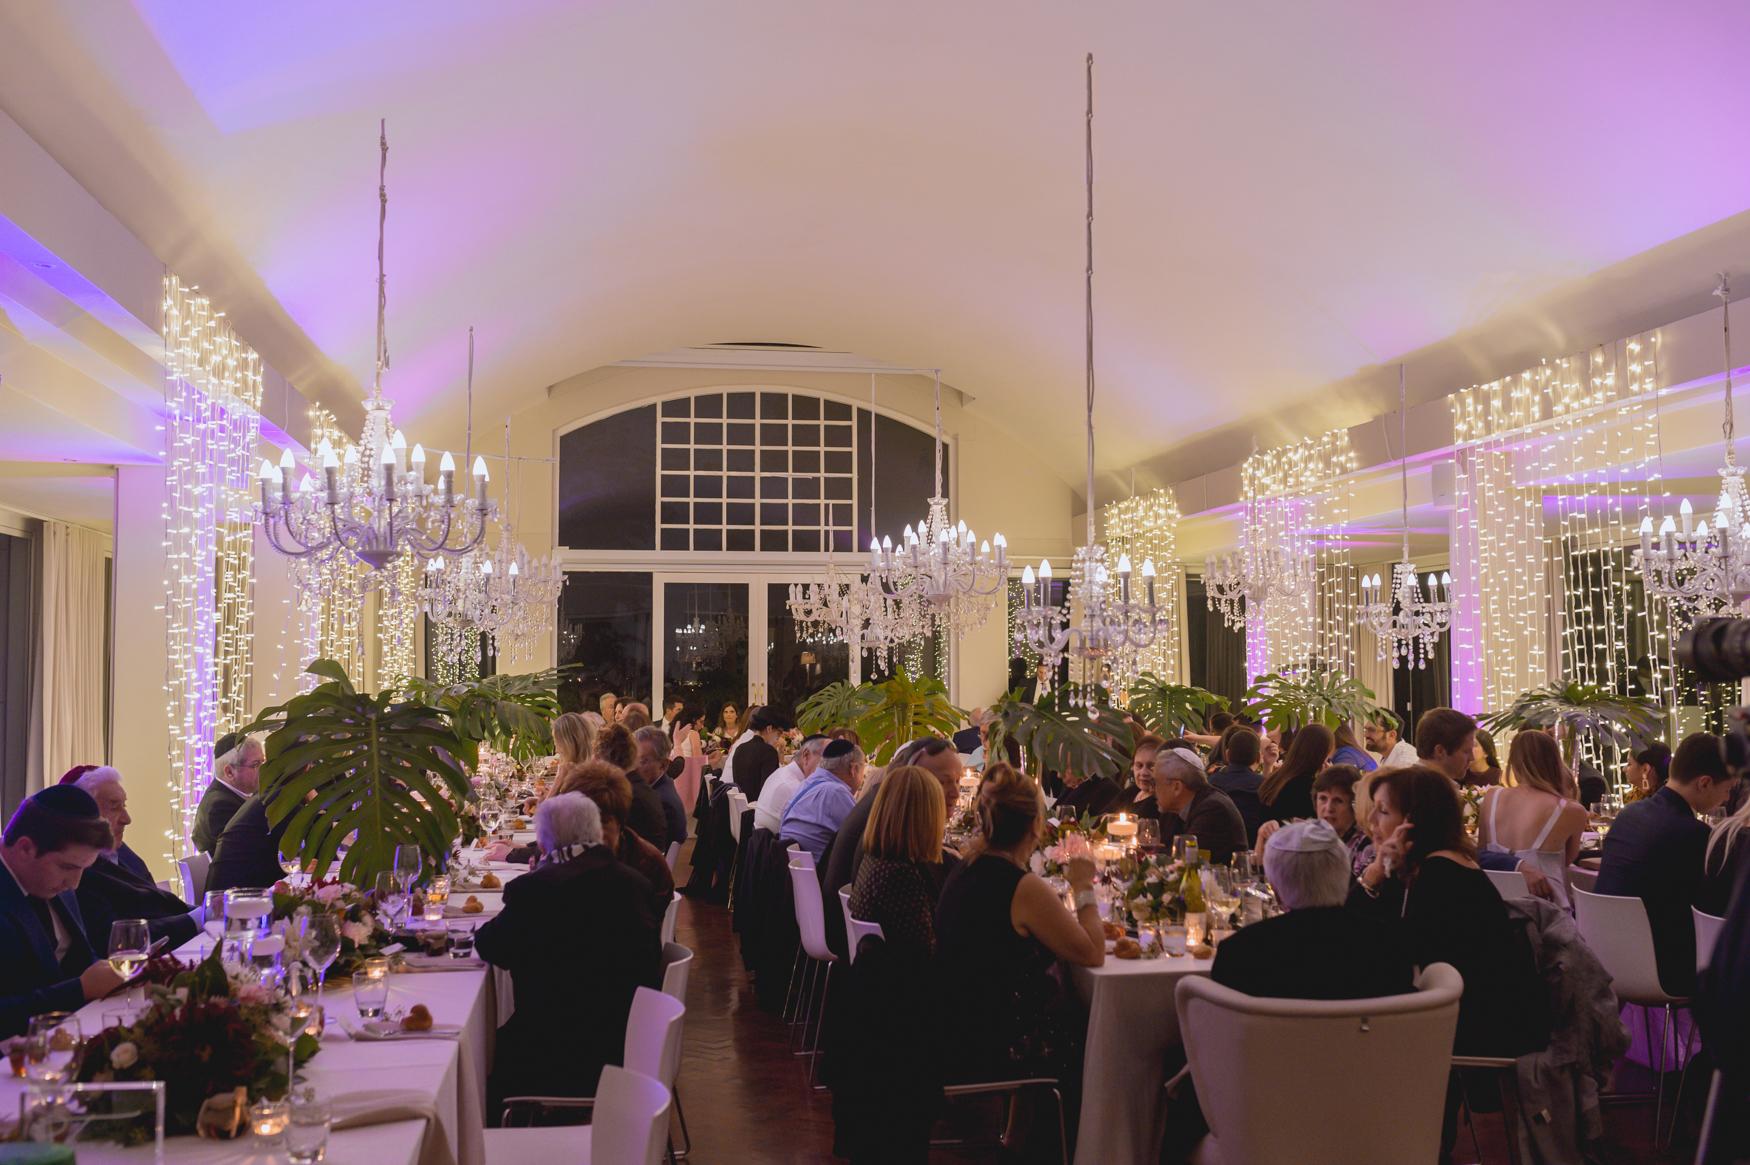 Leon_&_Martine's_Wedding_Photographs_17th_April_2019_@johnhenryweddingphoto_Low_Resolution_Web-521.JPG